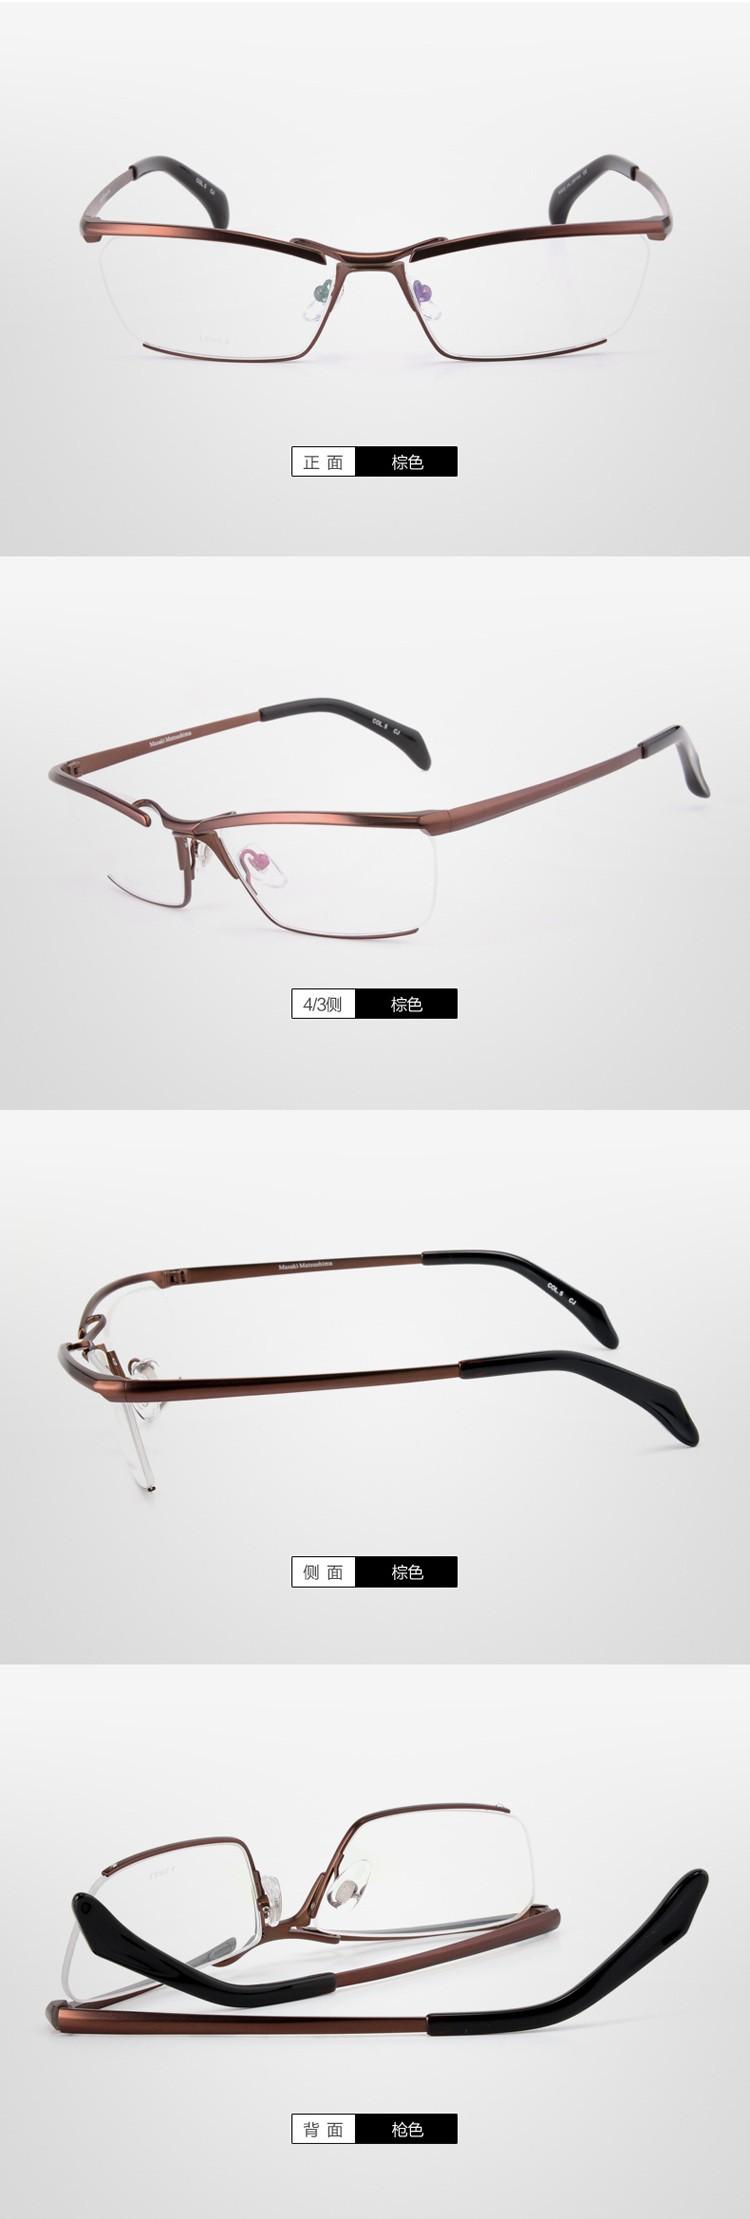 c36656032f3e0 ... Glasses Box  1 High Quality Microfiber Lens Cloth   HTB1G2LdLpXXXXbLXFXXq6xXFXXX8 HTB1gCveLpXXXXbqXFXXq6xXFXXXw  HTB1AfrfLpXXXXaQXFXXq6xXFXXX7